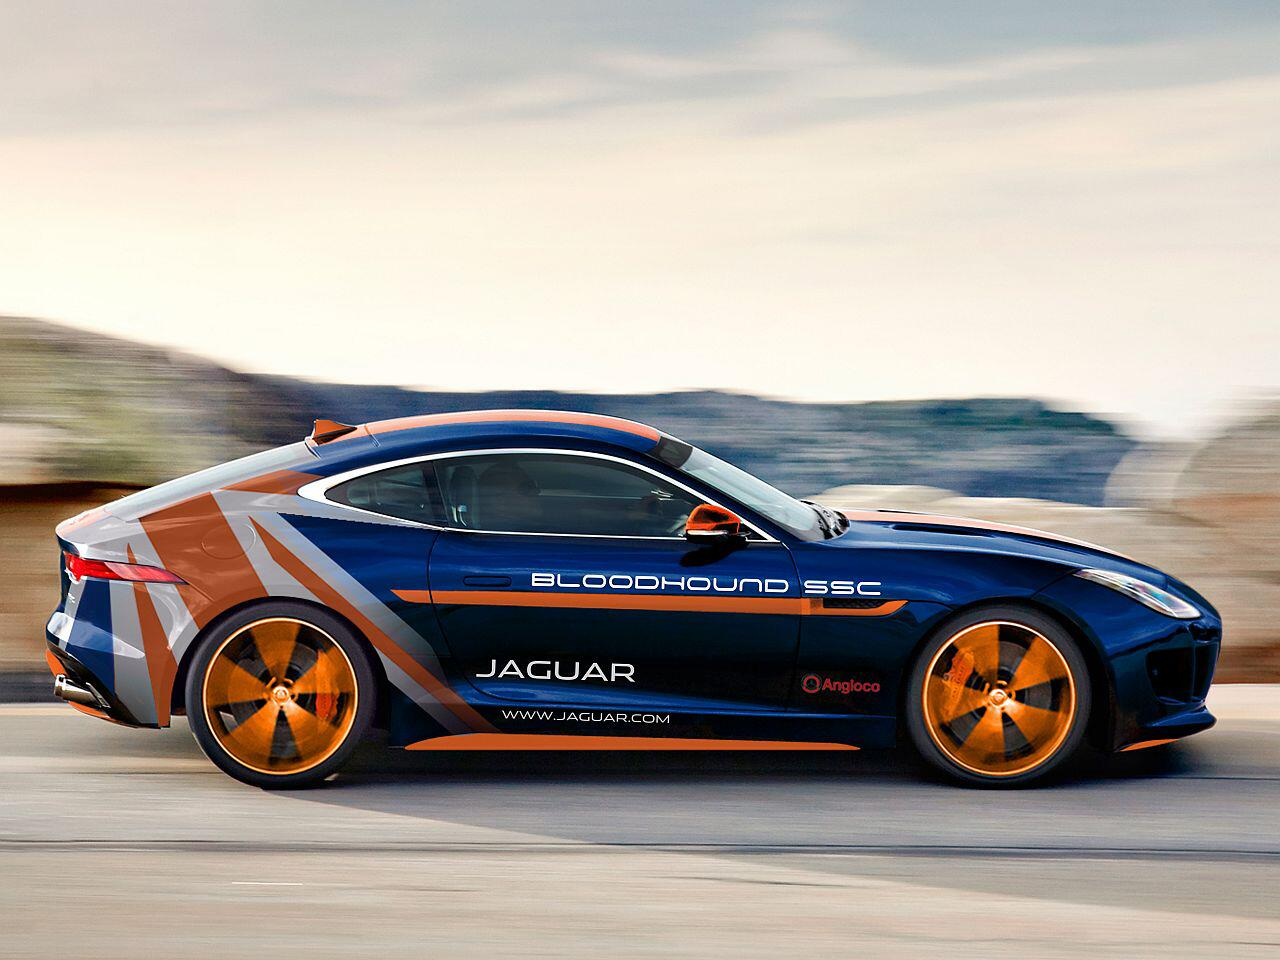 Bild zu Jaguar F-Type Rapid Response Vehicle